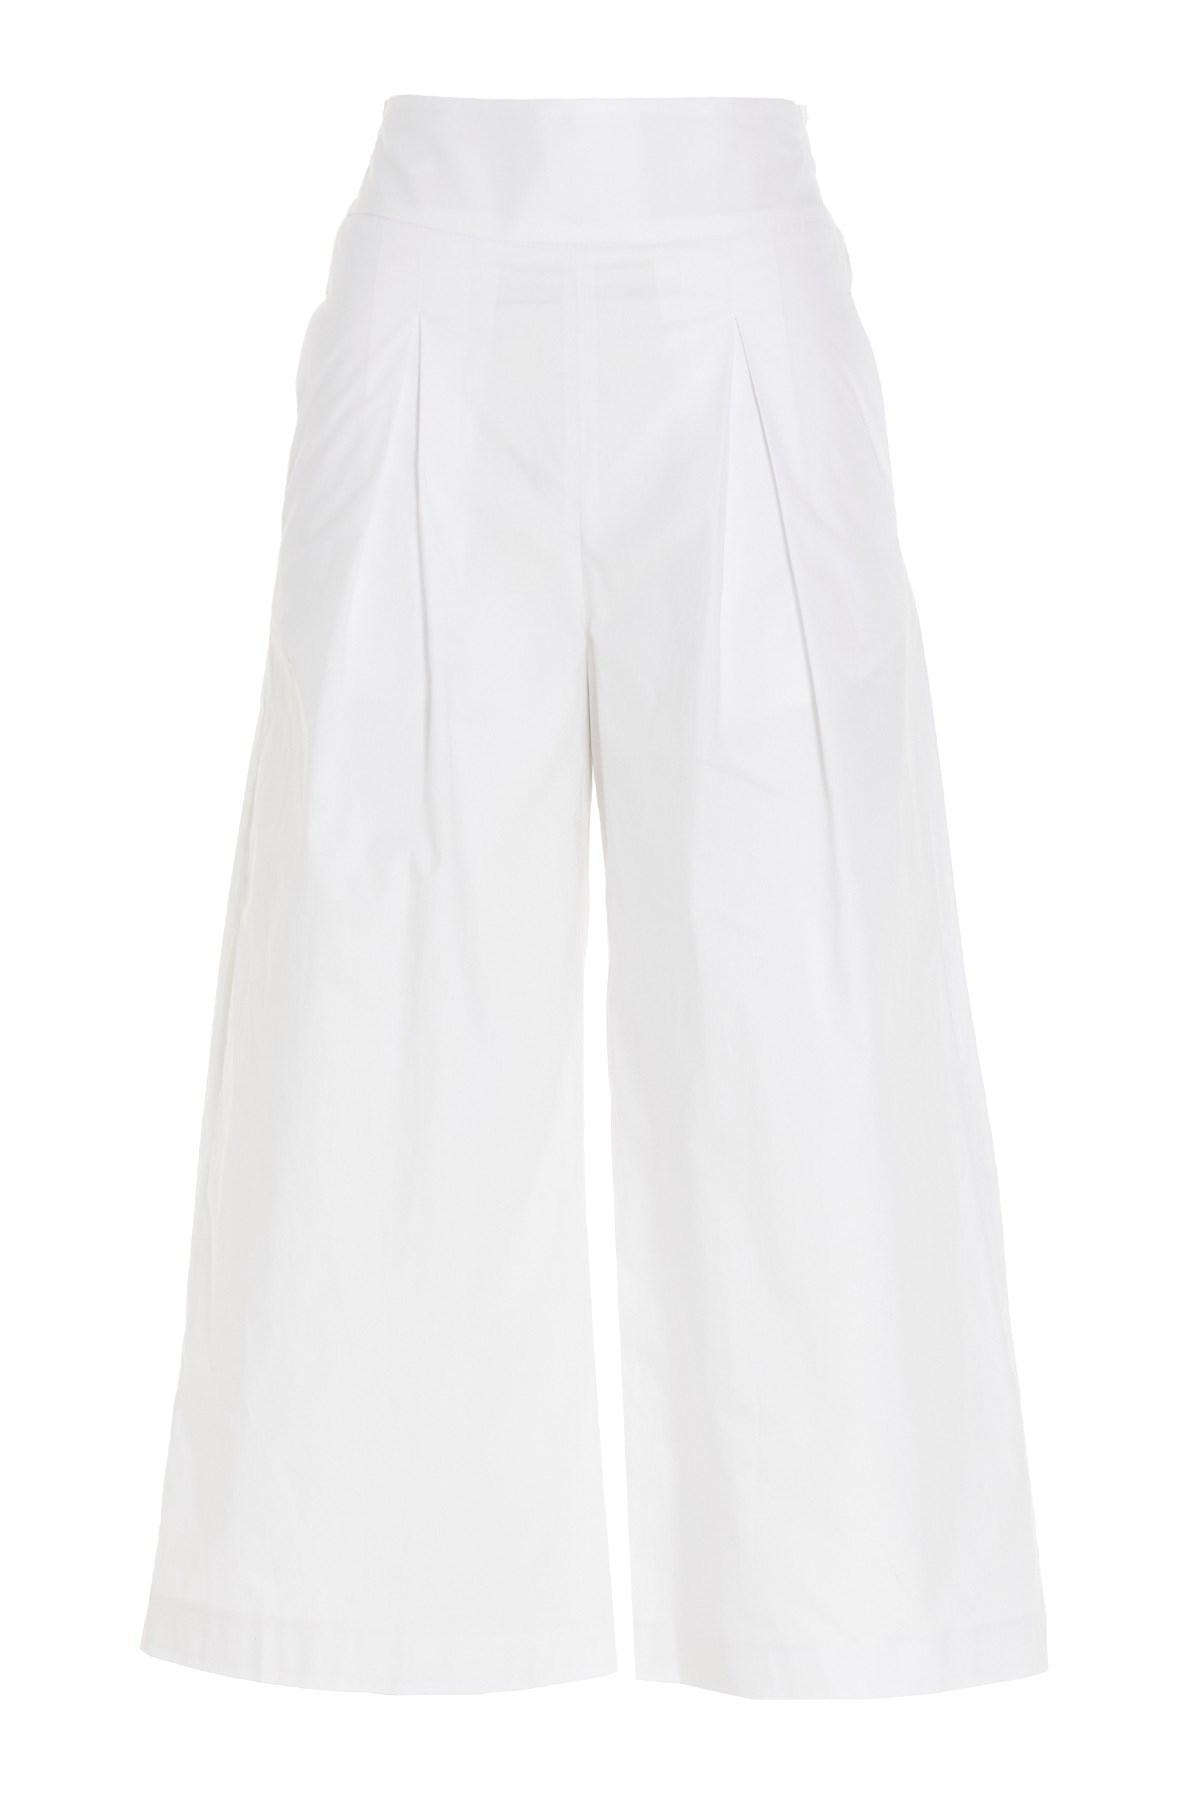 Pantalone Teso 4 cropped ampio bianco Pinko